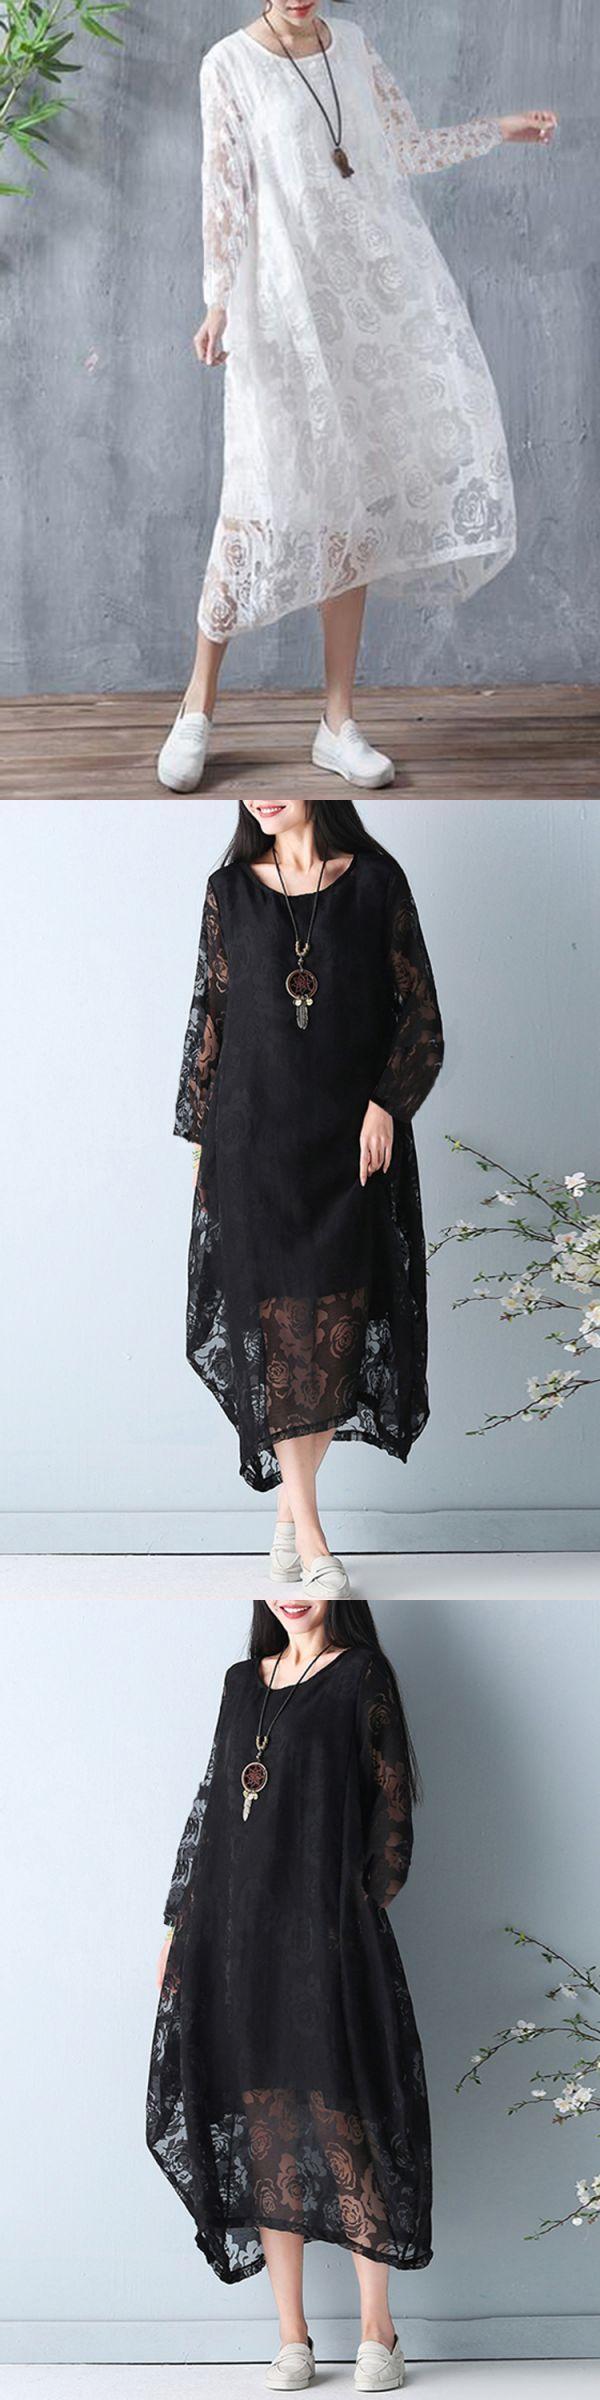 Floral dresses missguided elegant women long sleeve solid color